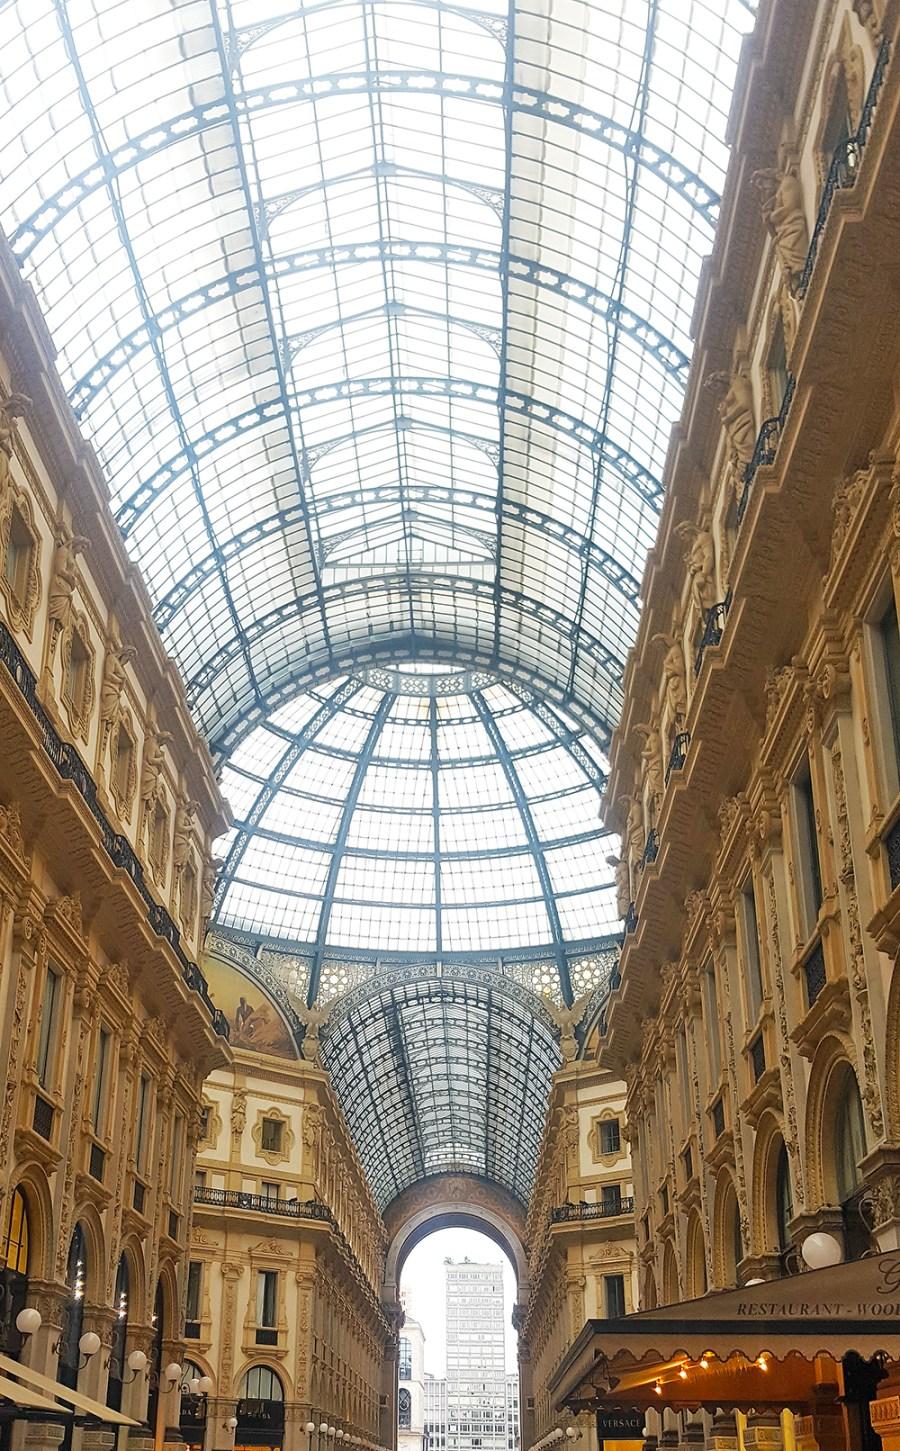 12 in Milan_Galleria Vittorio Emanuele II inside